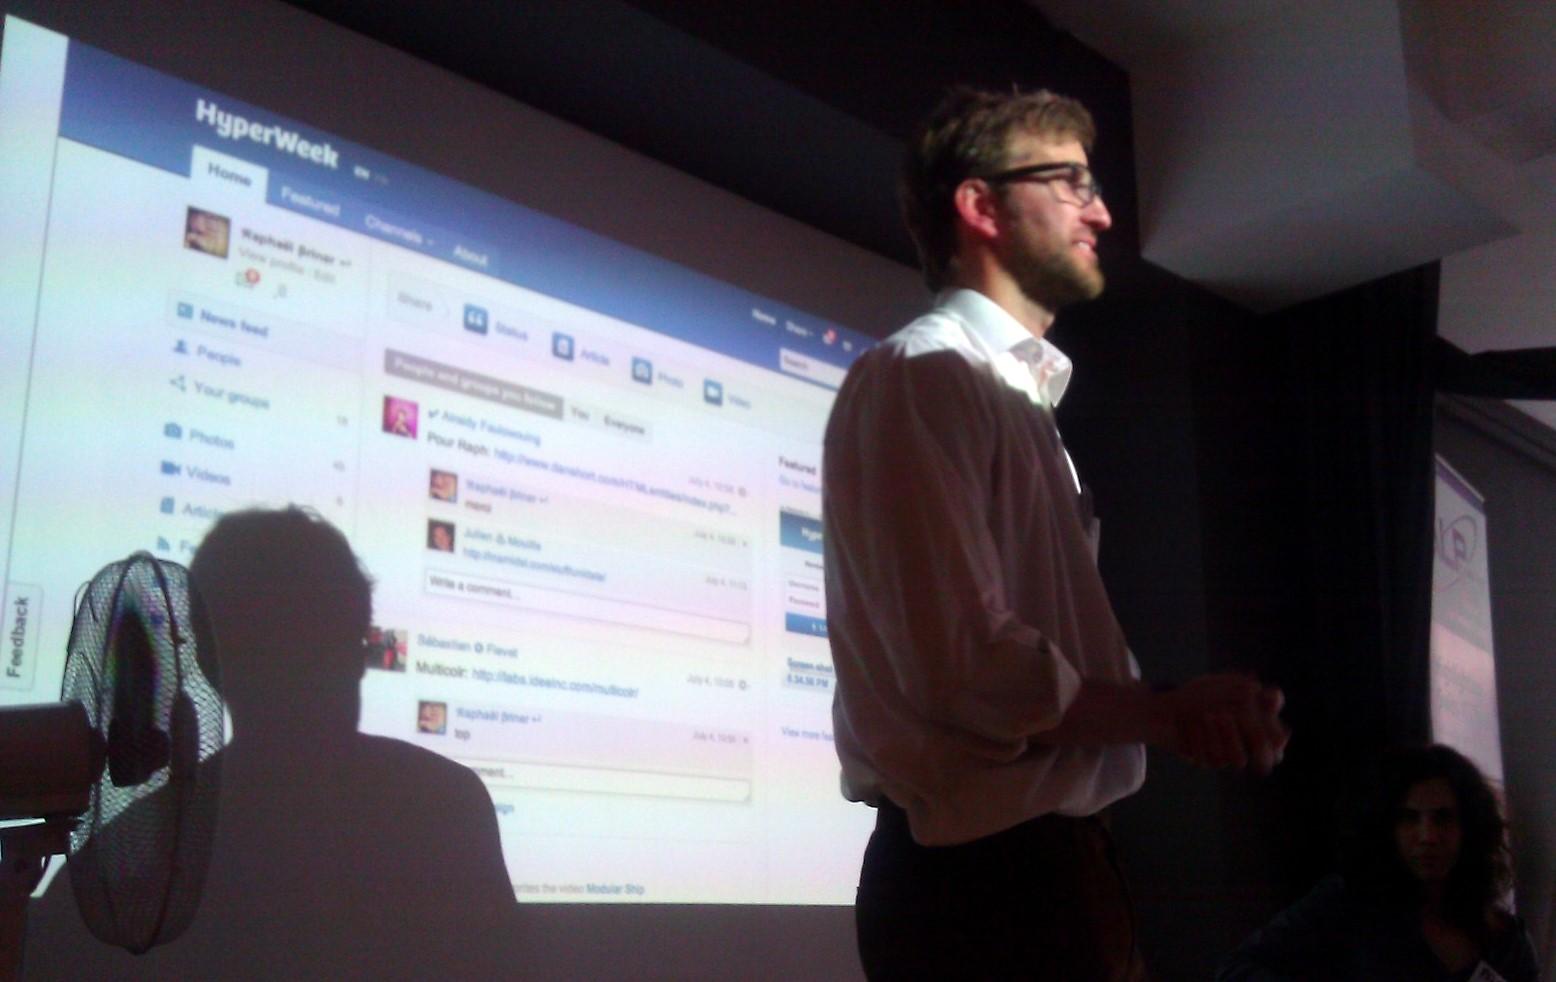 Mobile-Monday-Hyperweek-Raphael-Briner-speech